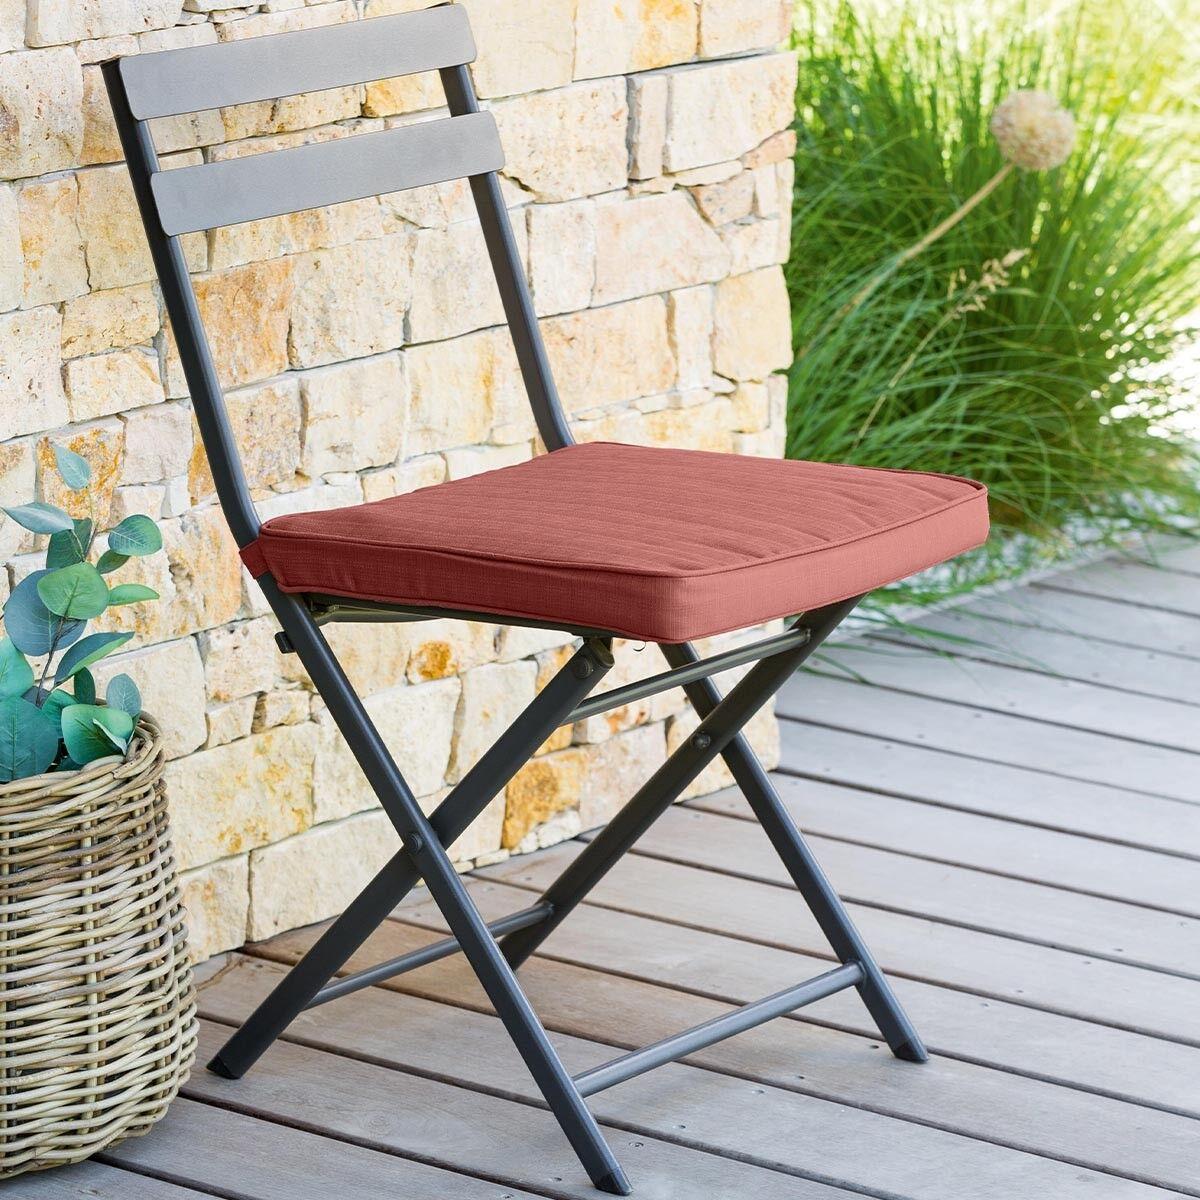 Hespéride Galette de chaise carrée Terracotta Jardin